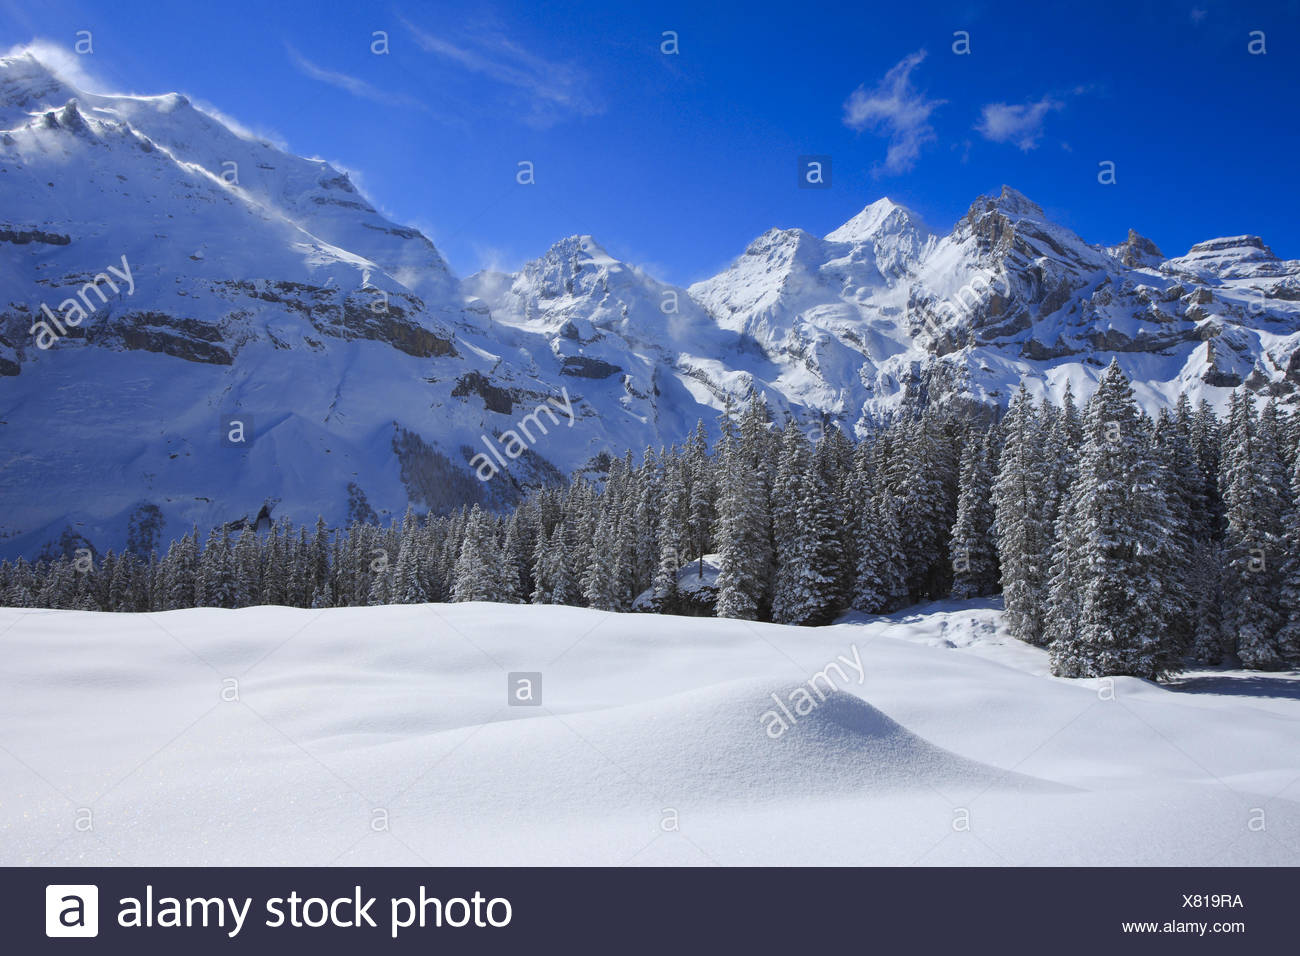 snowy mountain scenery with Blueemlisalp Rothorn, Blueemlisalphorn, Oeschinenhorn, Switzerland, Bernese Alps - Stock Image